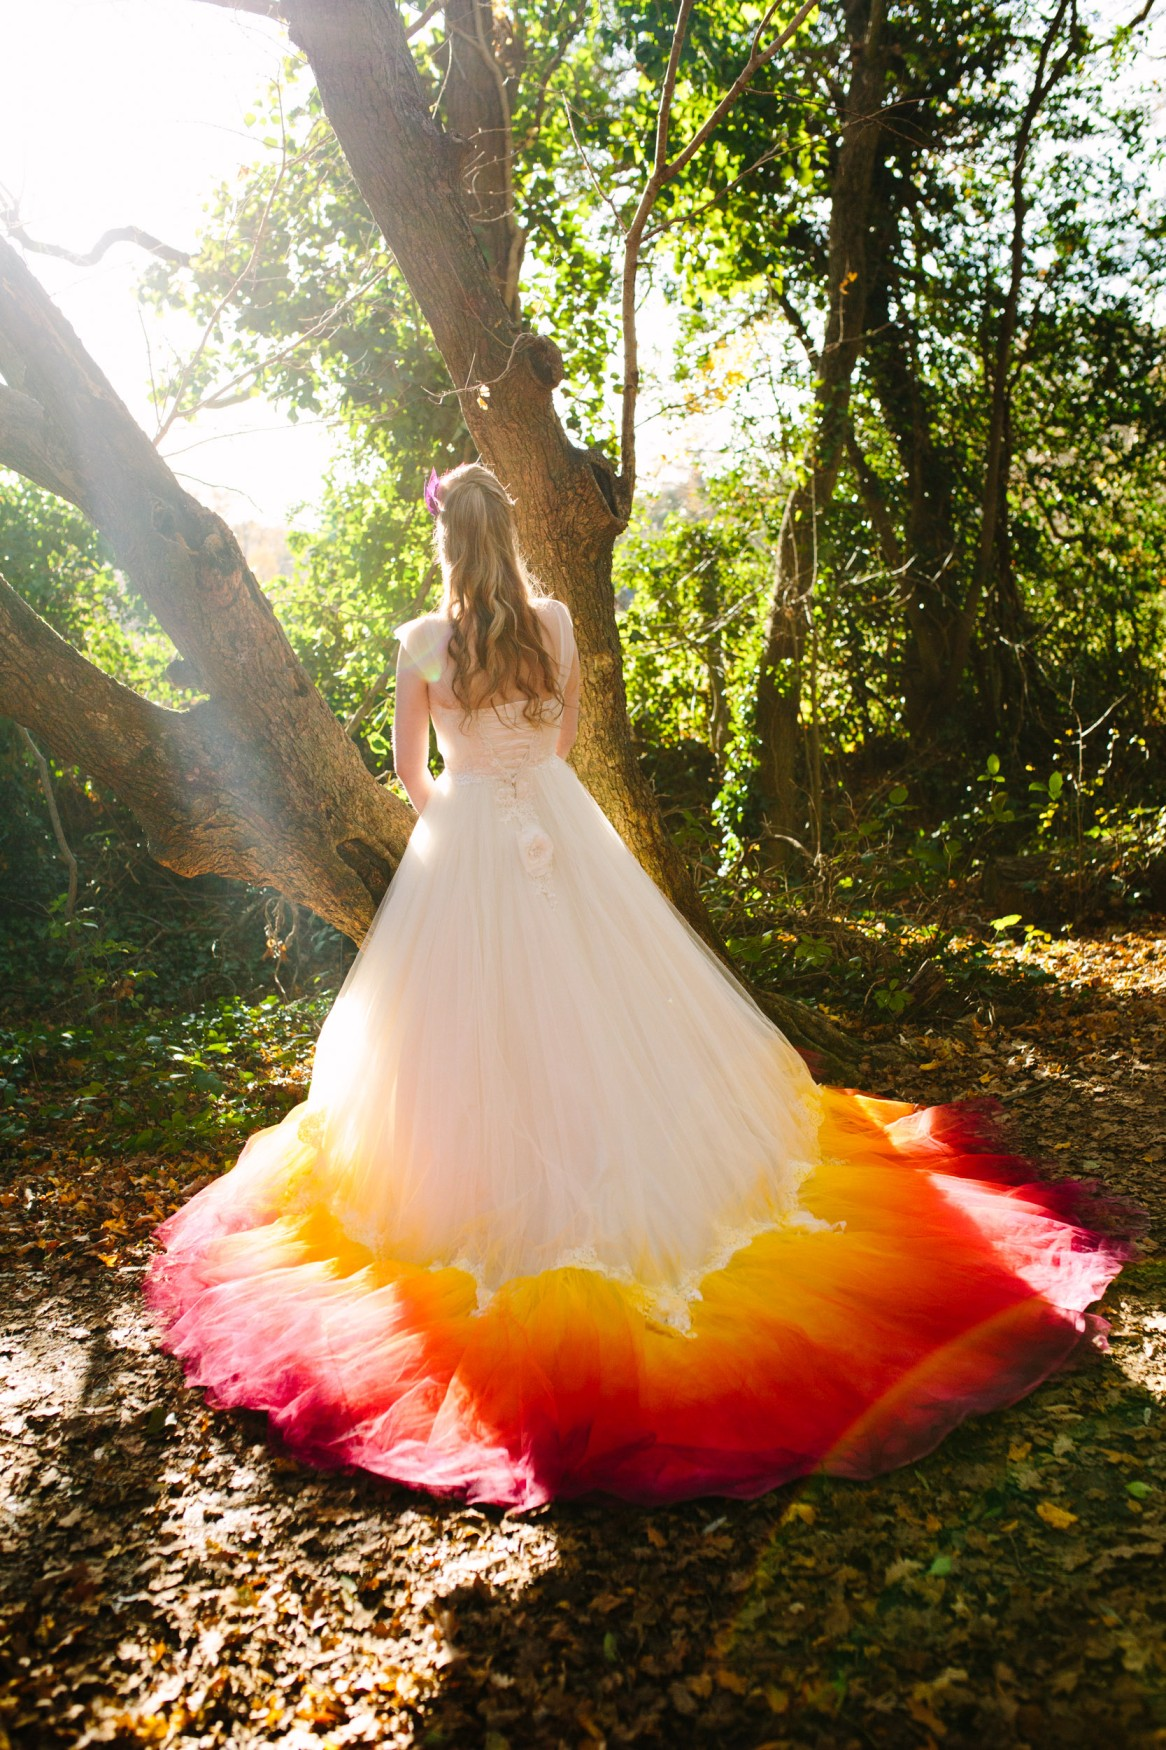 ombre wedding dress - dip dye wedding dress - alternative wedding dress - alternative bridal wear - colourful wedding dress - autumn wedding dress